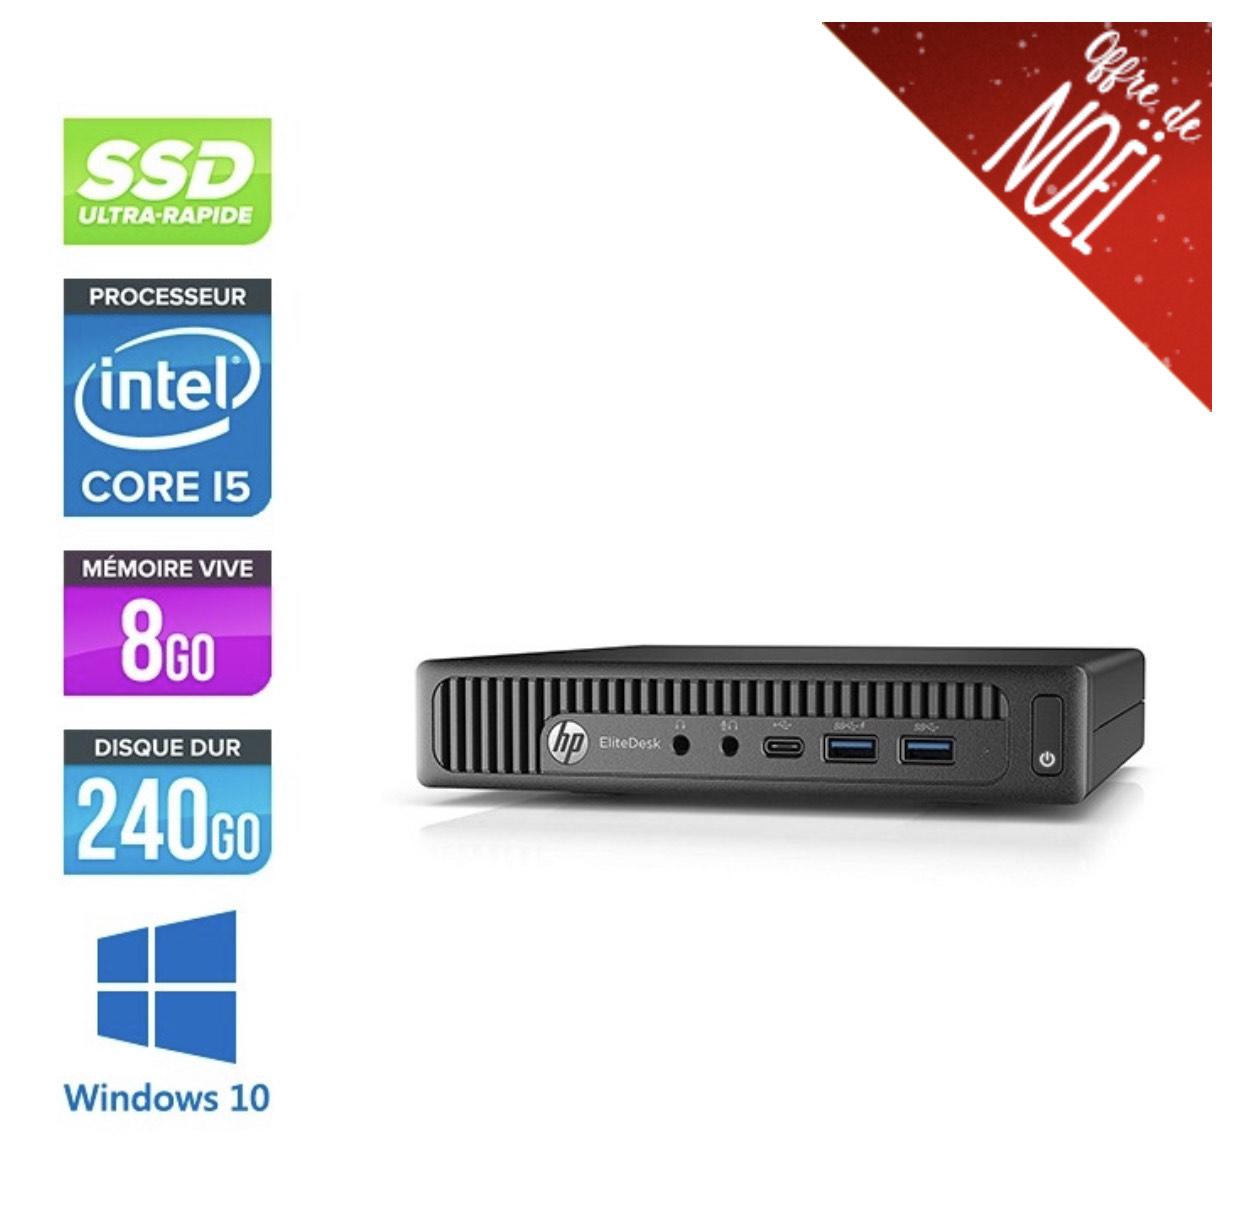 PC de bureau HP - i5-6500T 2.50 GHz, 8 Go RAM, SSD 240 Go, Reconditionné